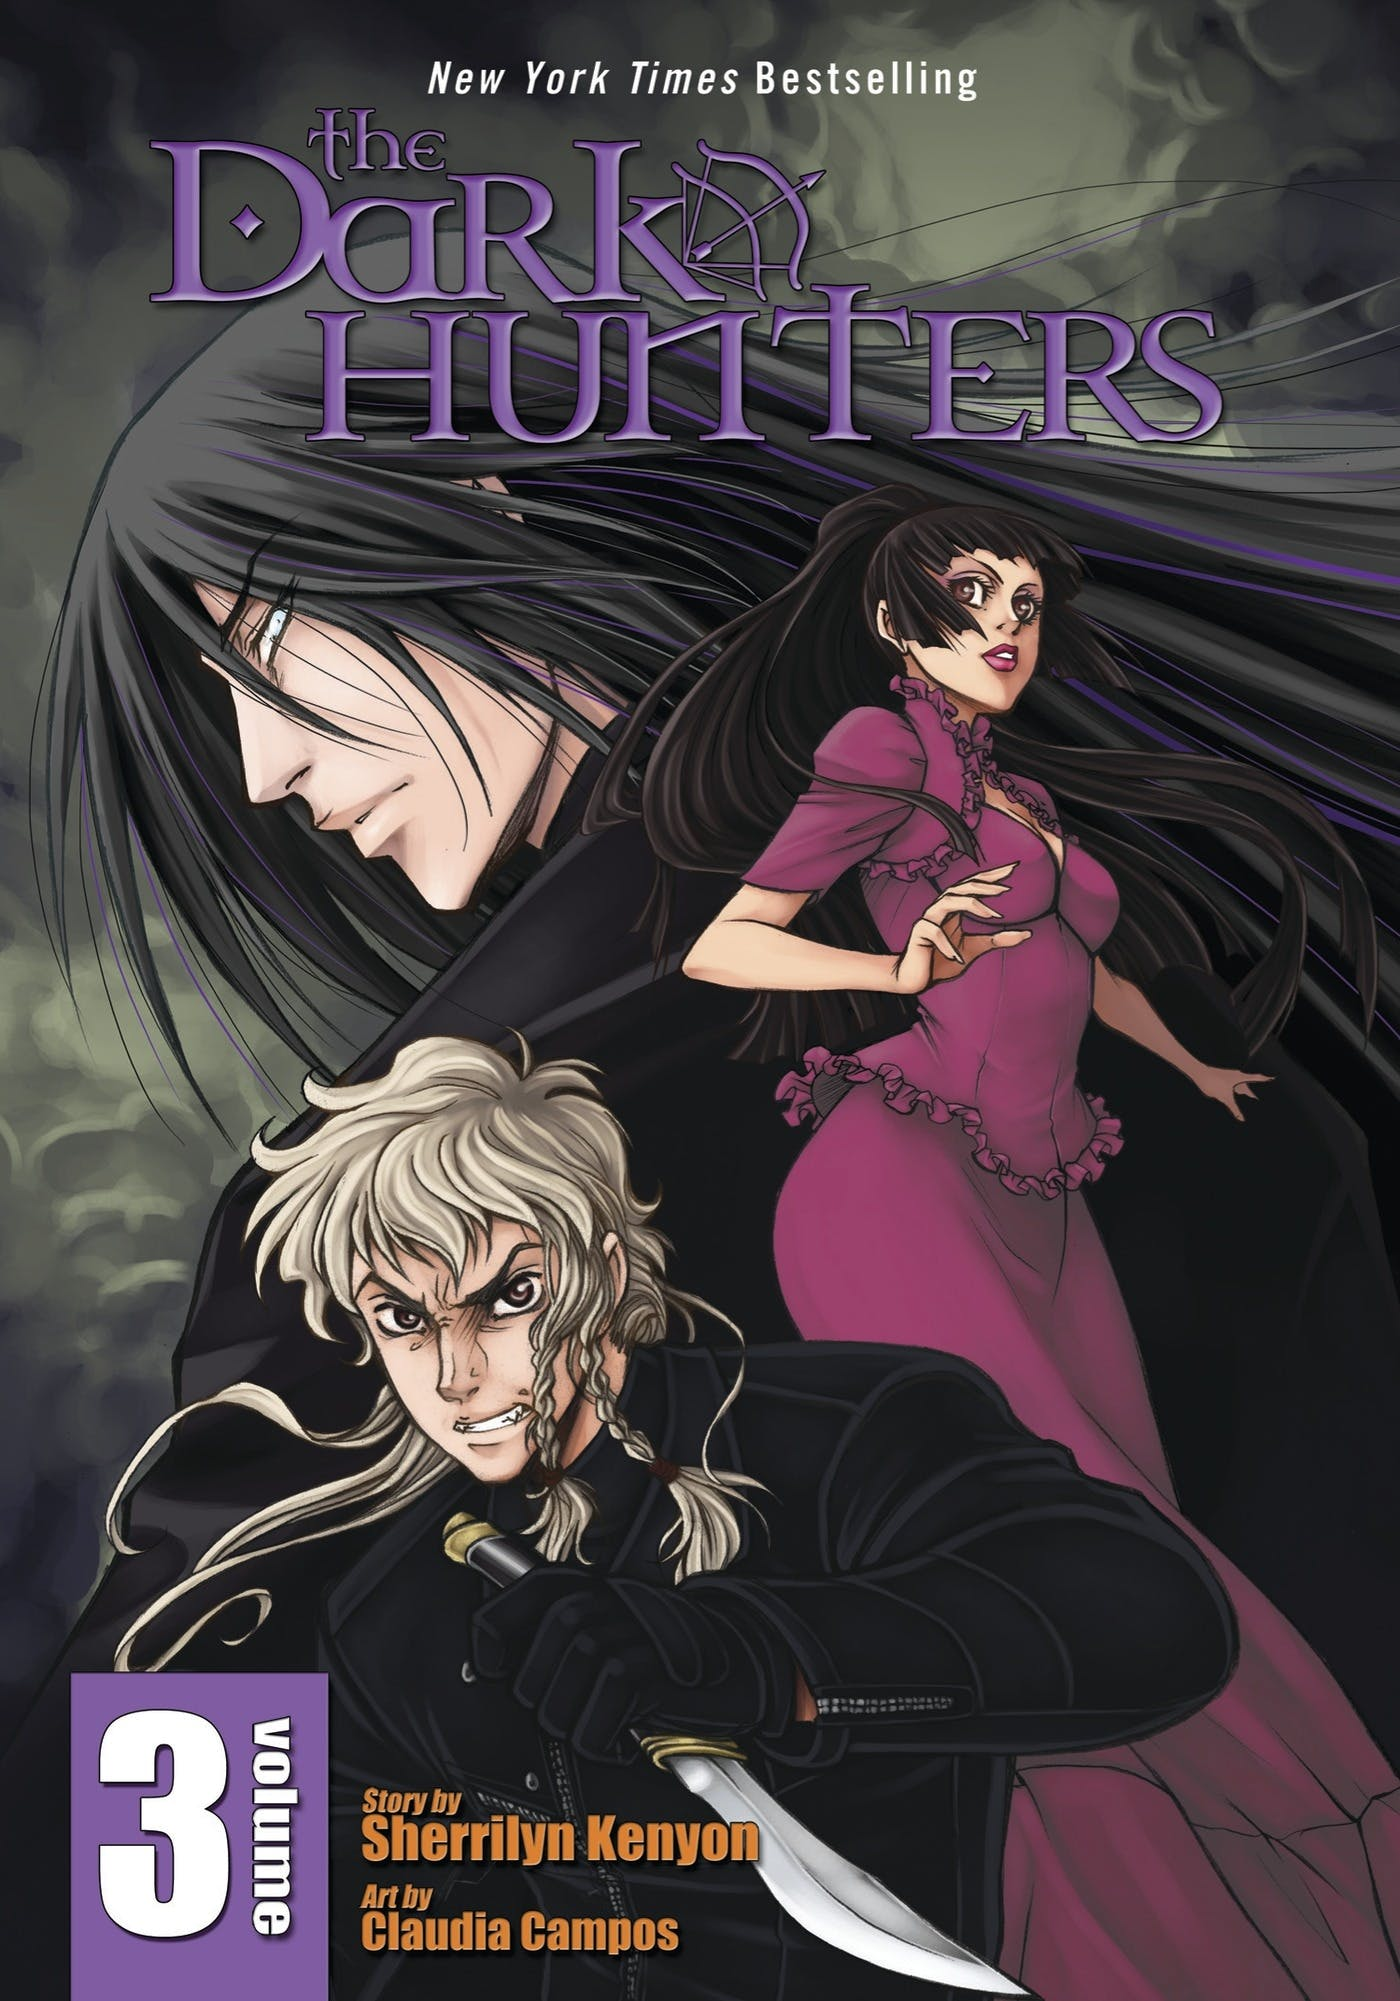 Image of The Dark-Hunters, Vol. 3